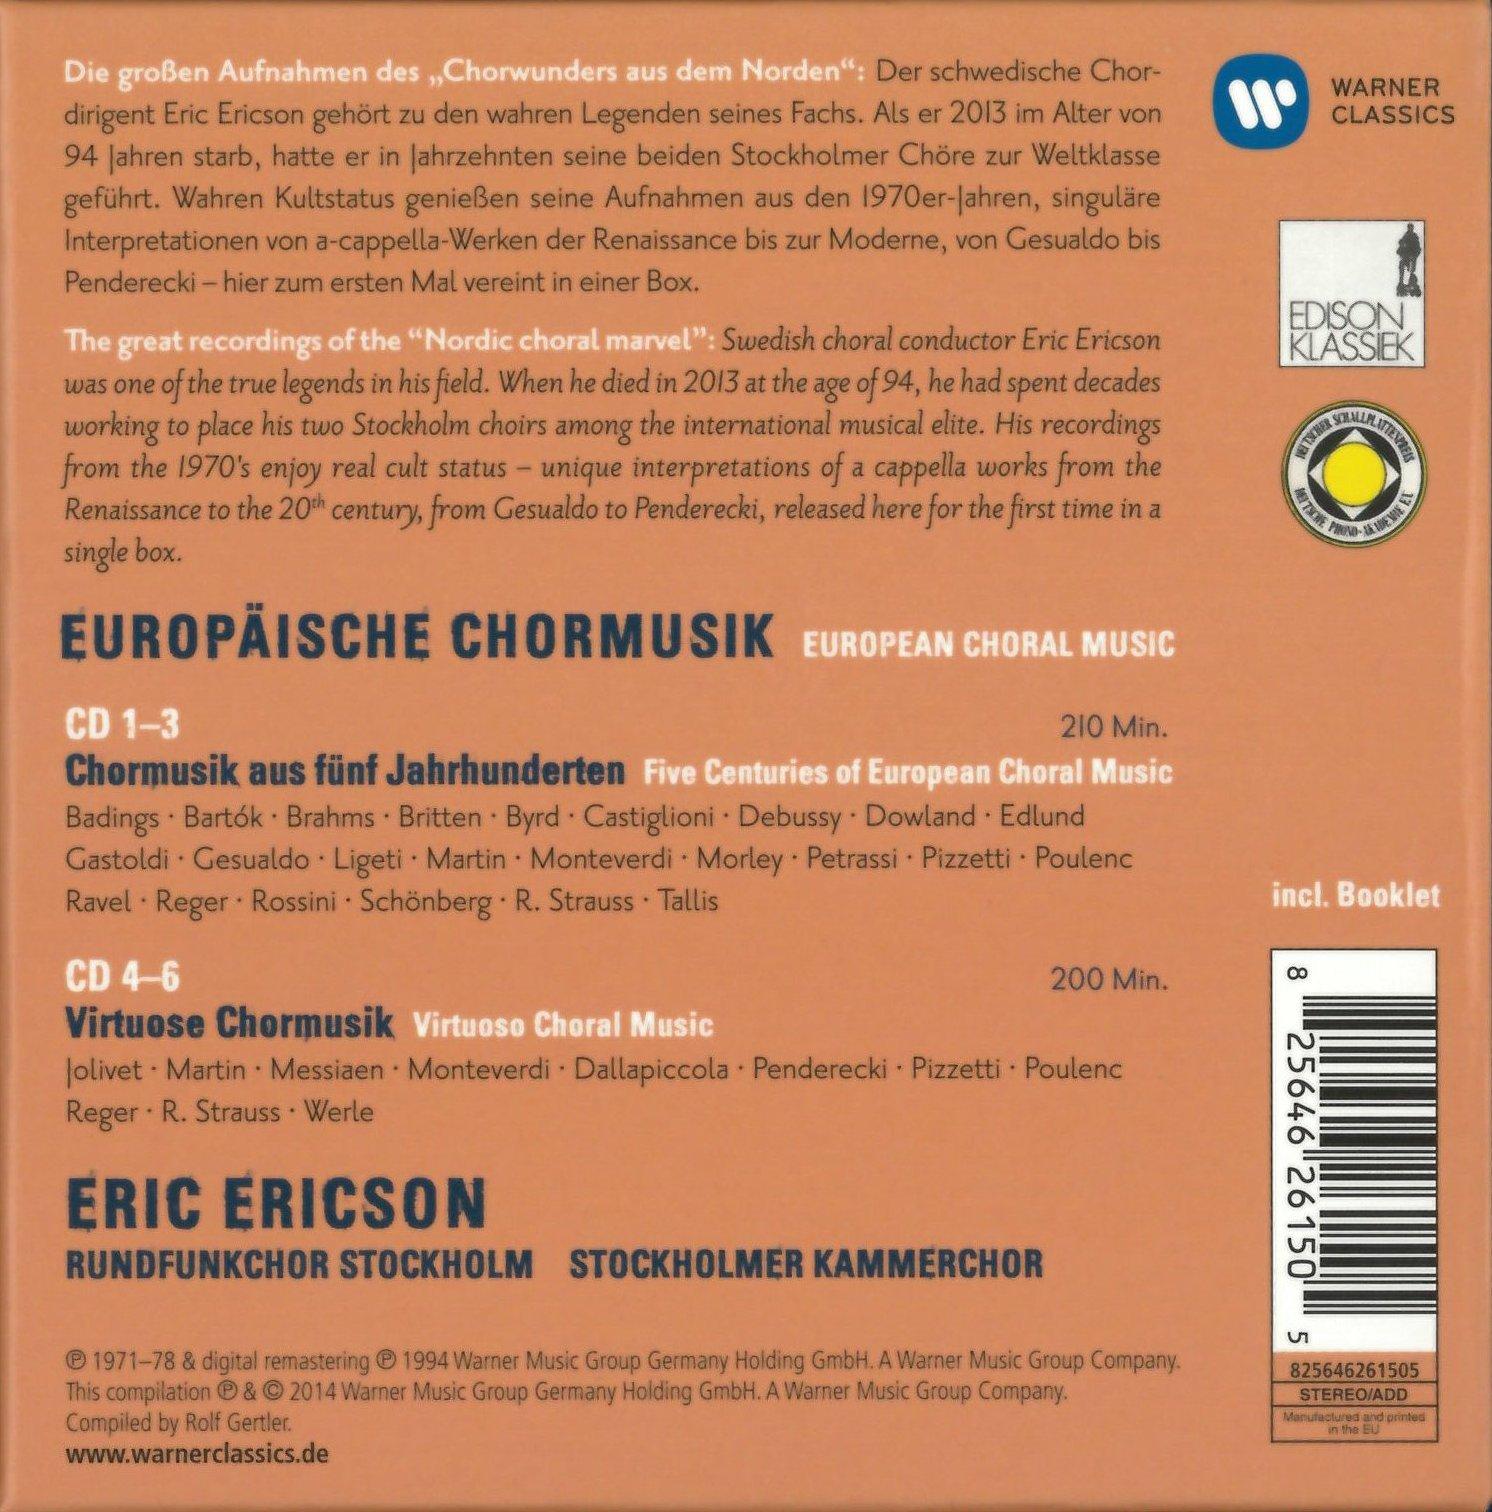 Eric Ericson, Rundfunkchor Stockholm, Stockholmer Kammerchor - European Choral Music (2014) 6CD Box Set